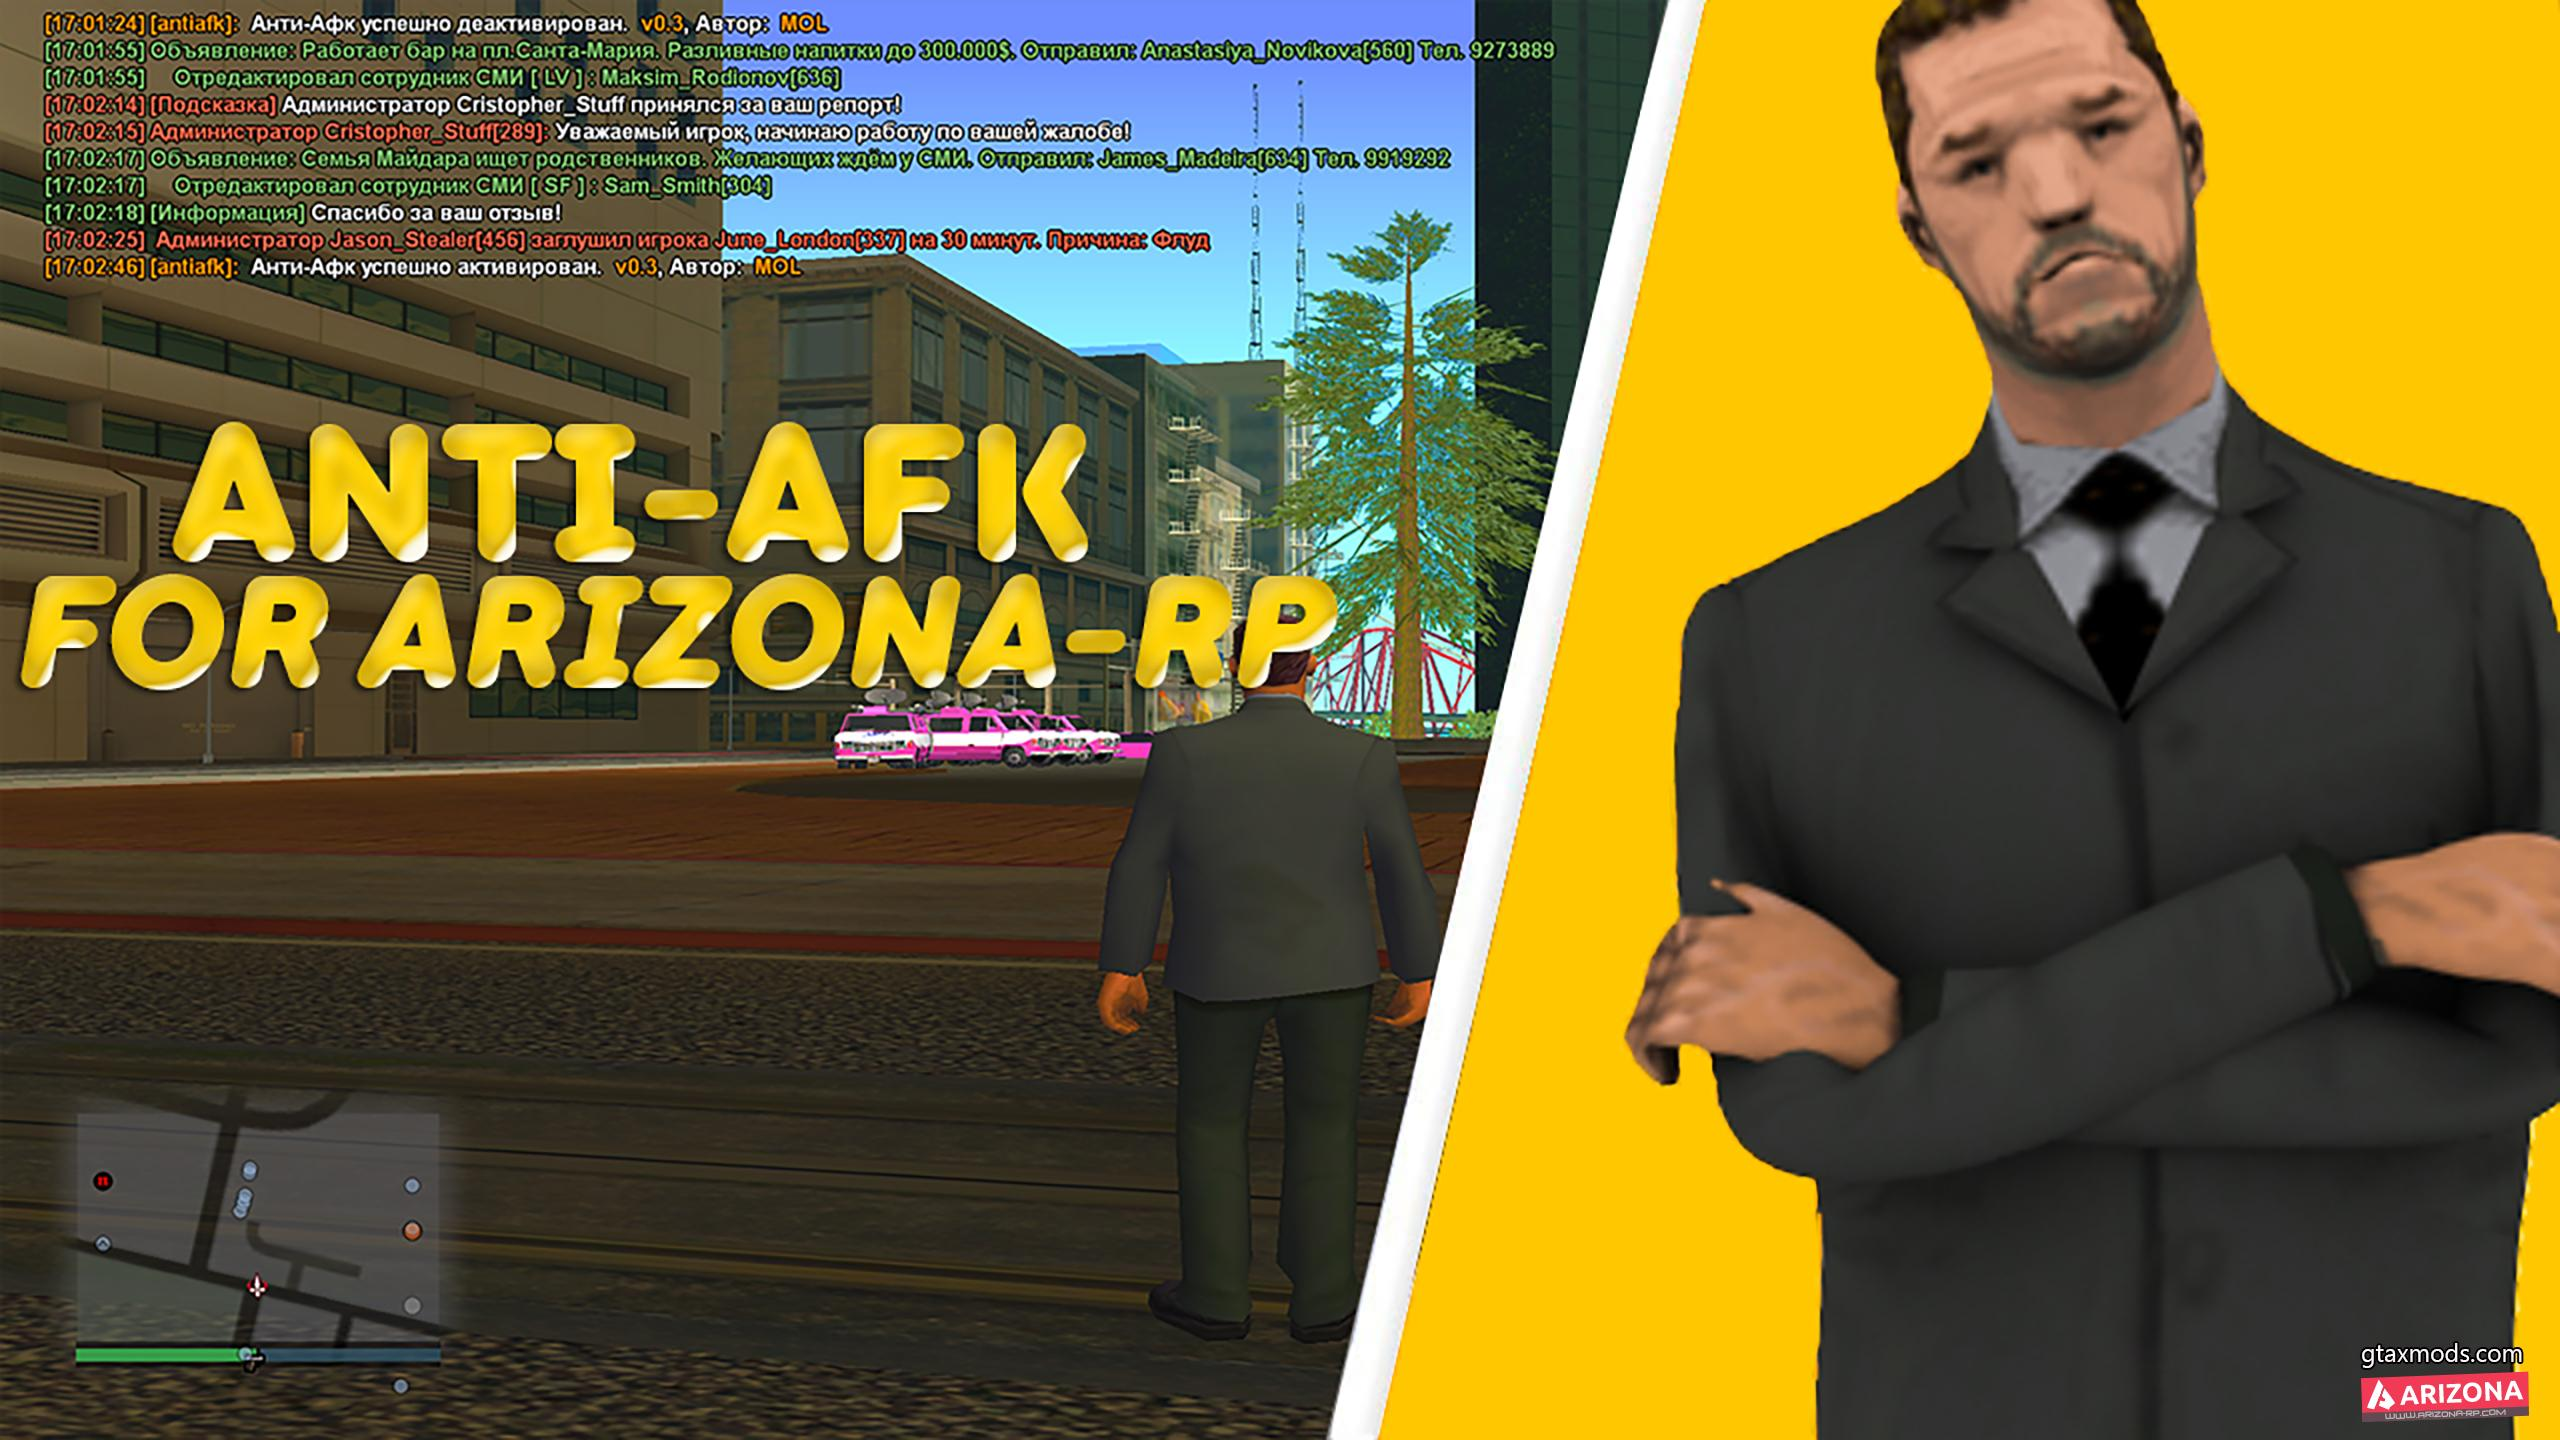 [LUA] ANTI-AFK FOR ARIZONA-RP